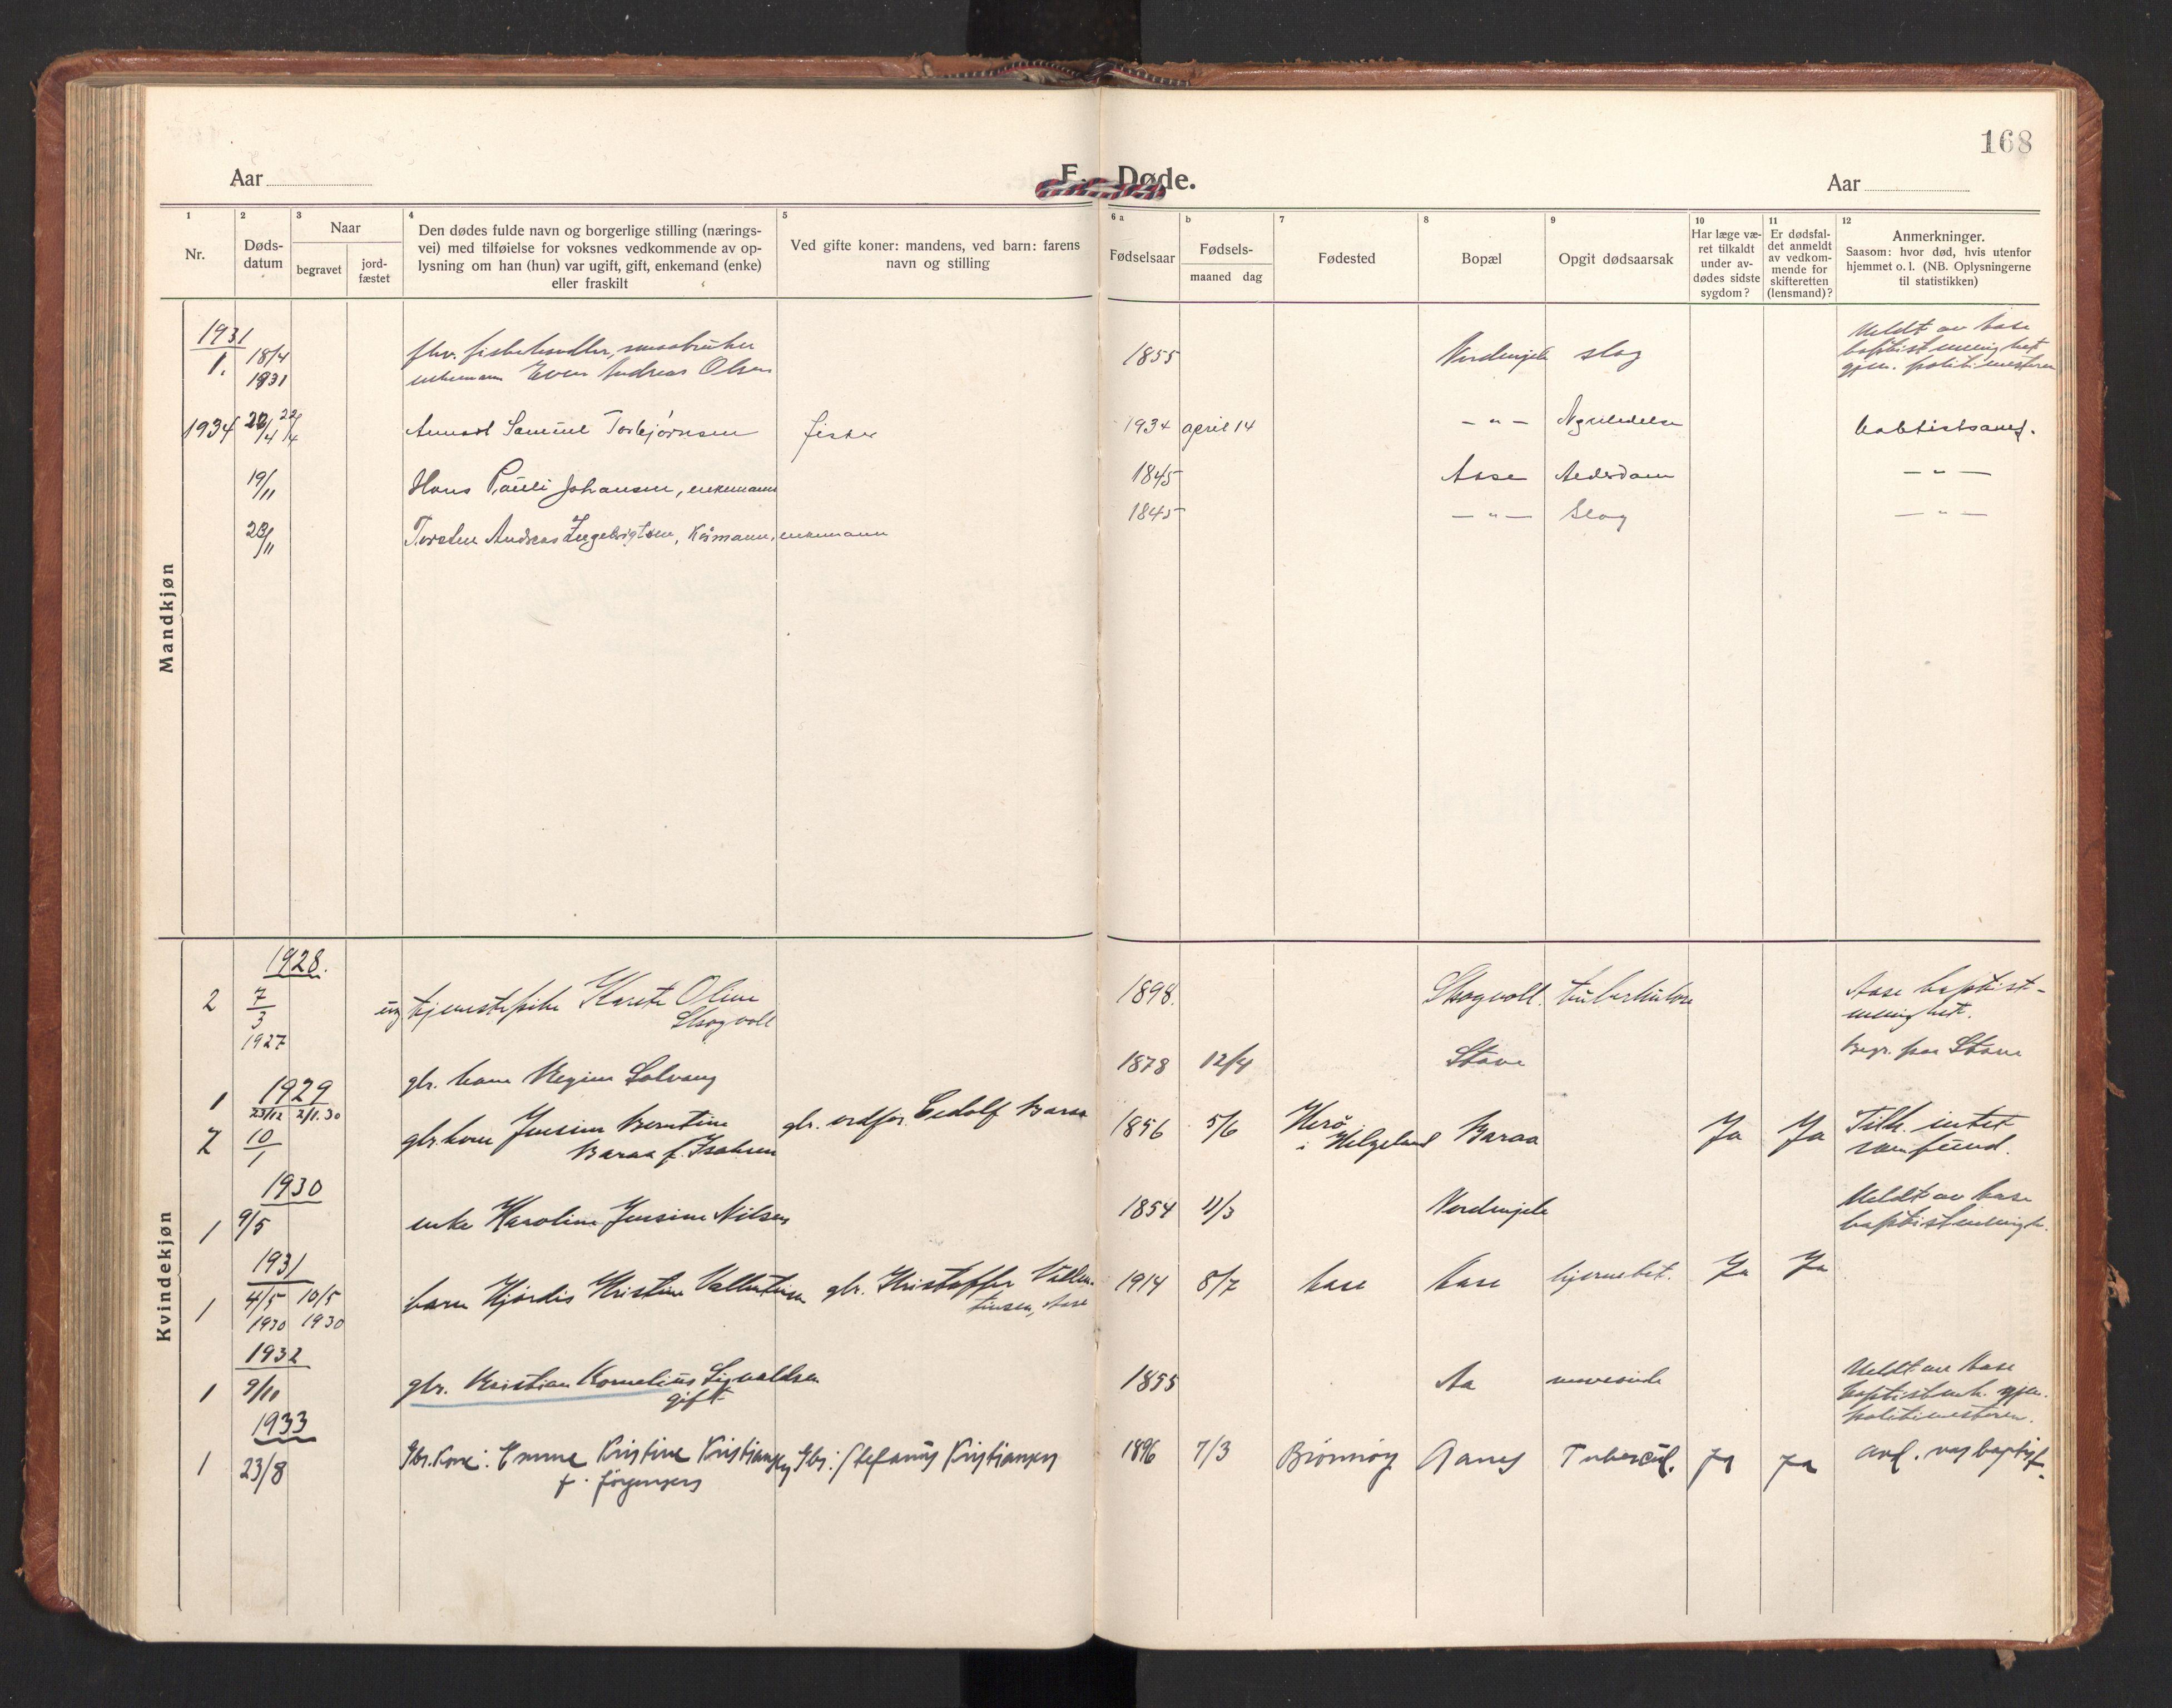 SAT, Ministerialprotokoller, klokkerbøker og fødselsregistre - Nordland, 897/L1408: Ministerialbok nr. 897A15, 1922-1938, s. 168